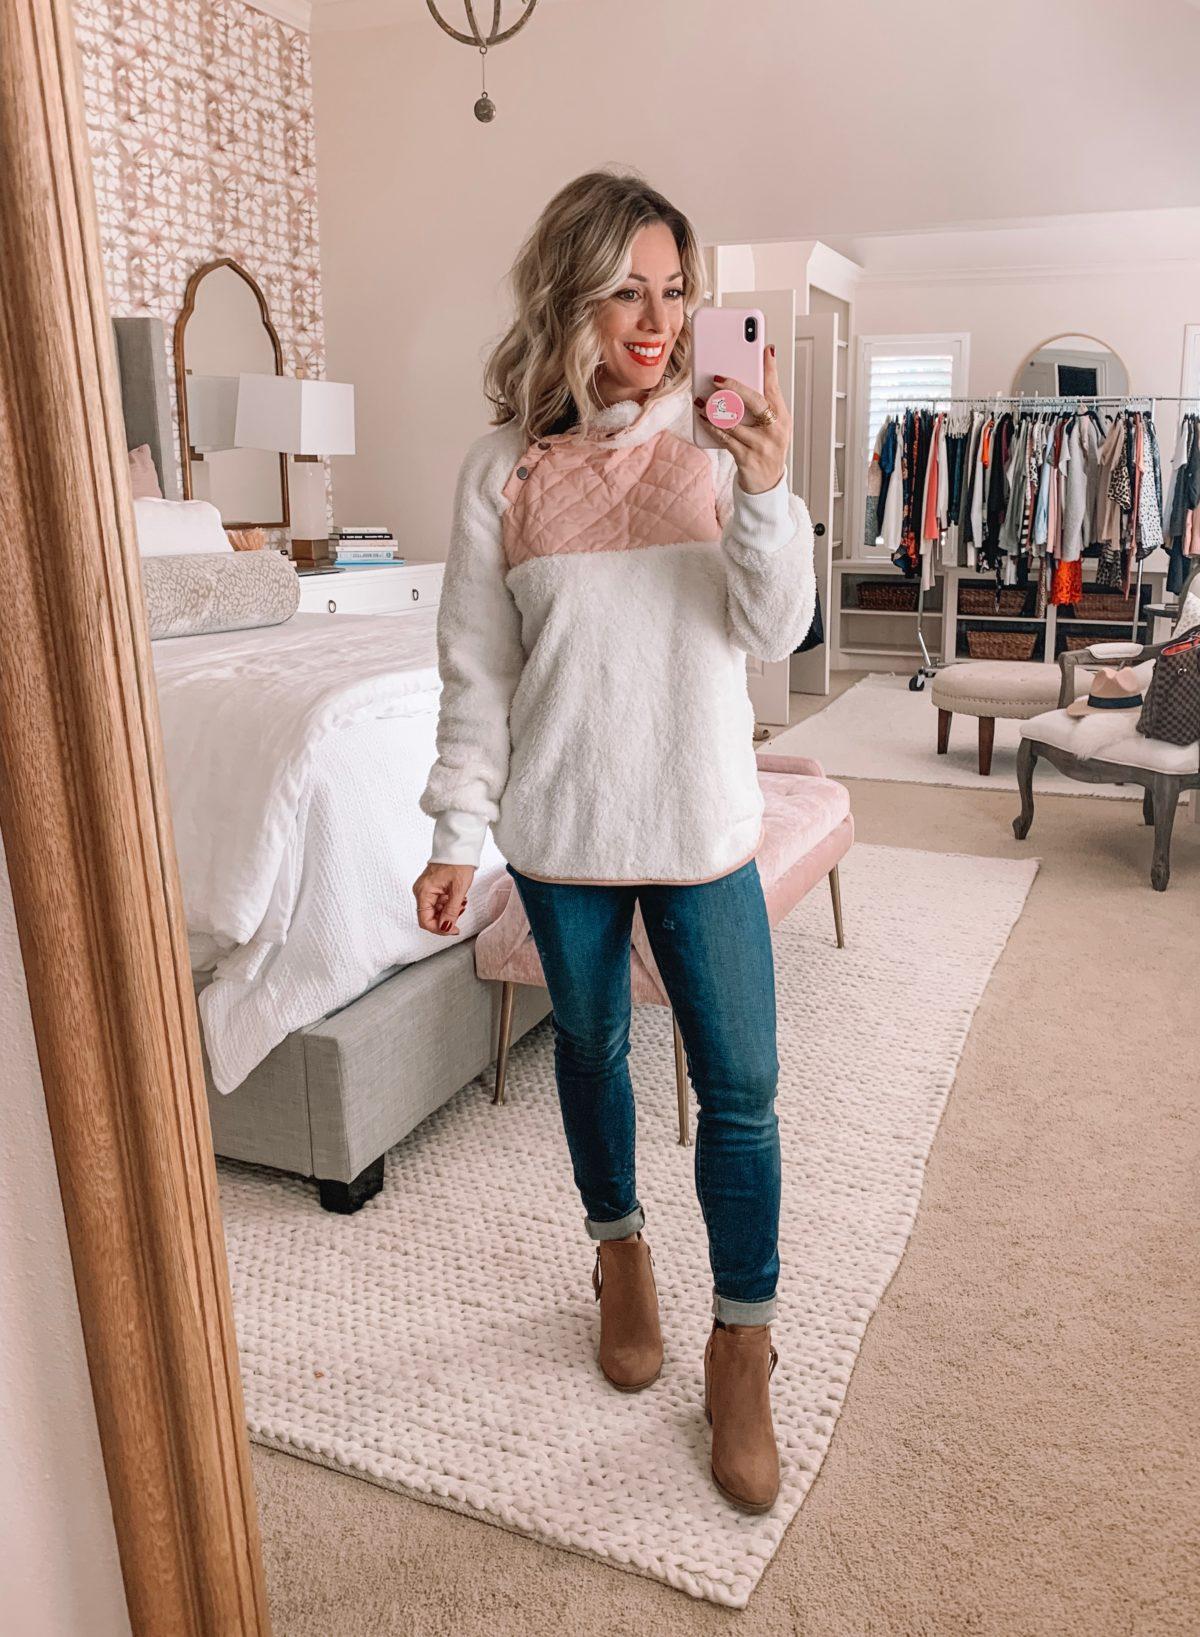 Amazon Prime Fashion- Fleece and Jeans